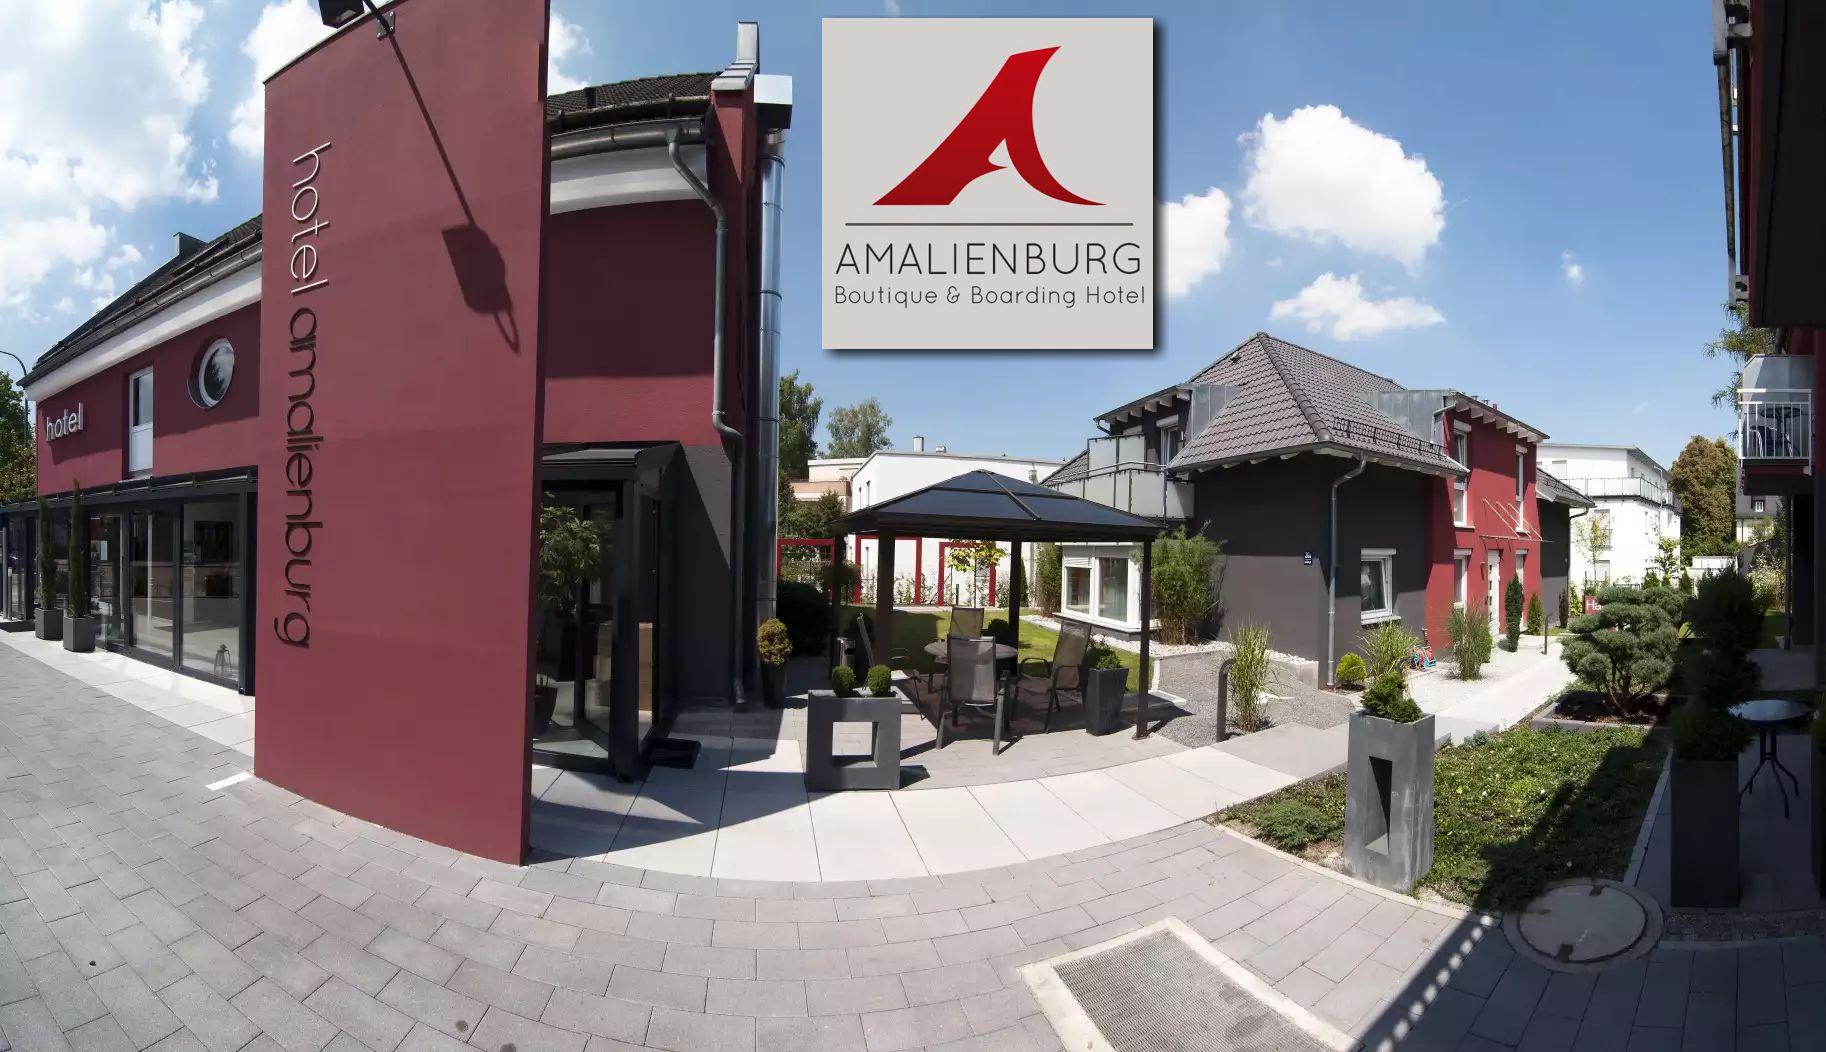 Hotel Amalienburg Boutique Boarding Hotel Das Touristik Portal